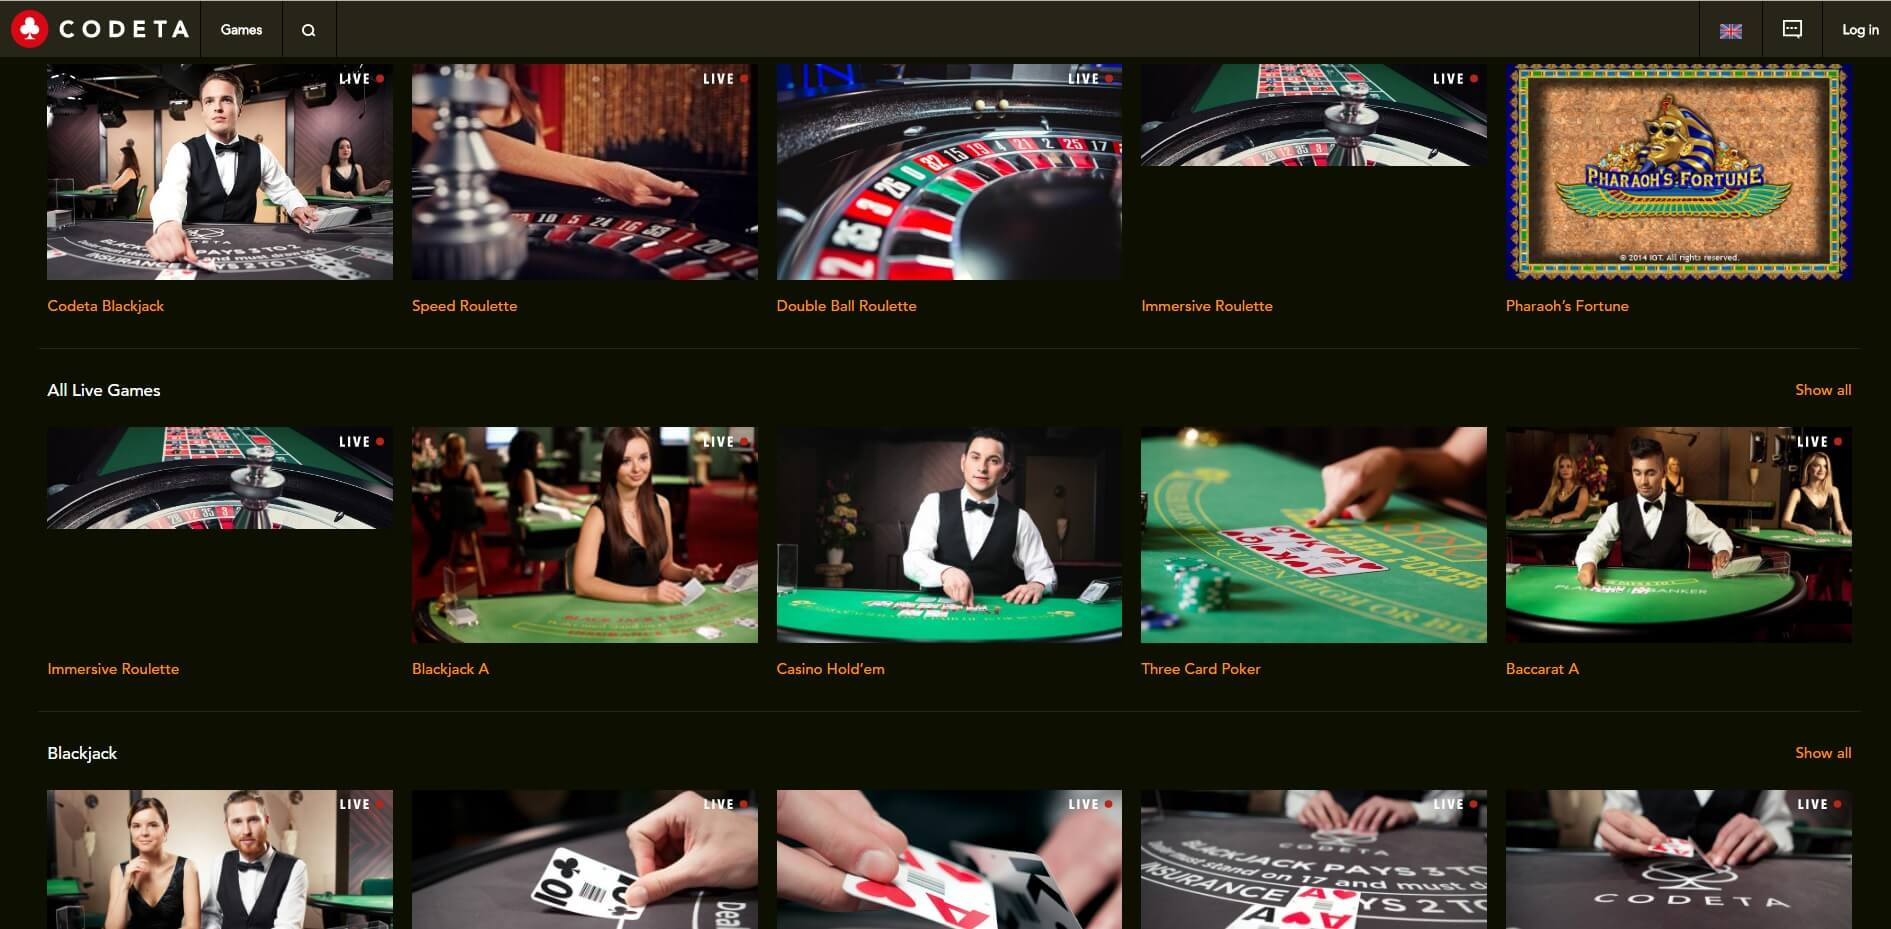 codeta casino games live